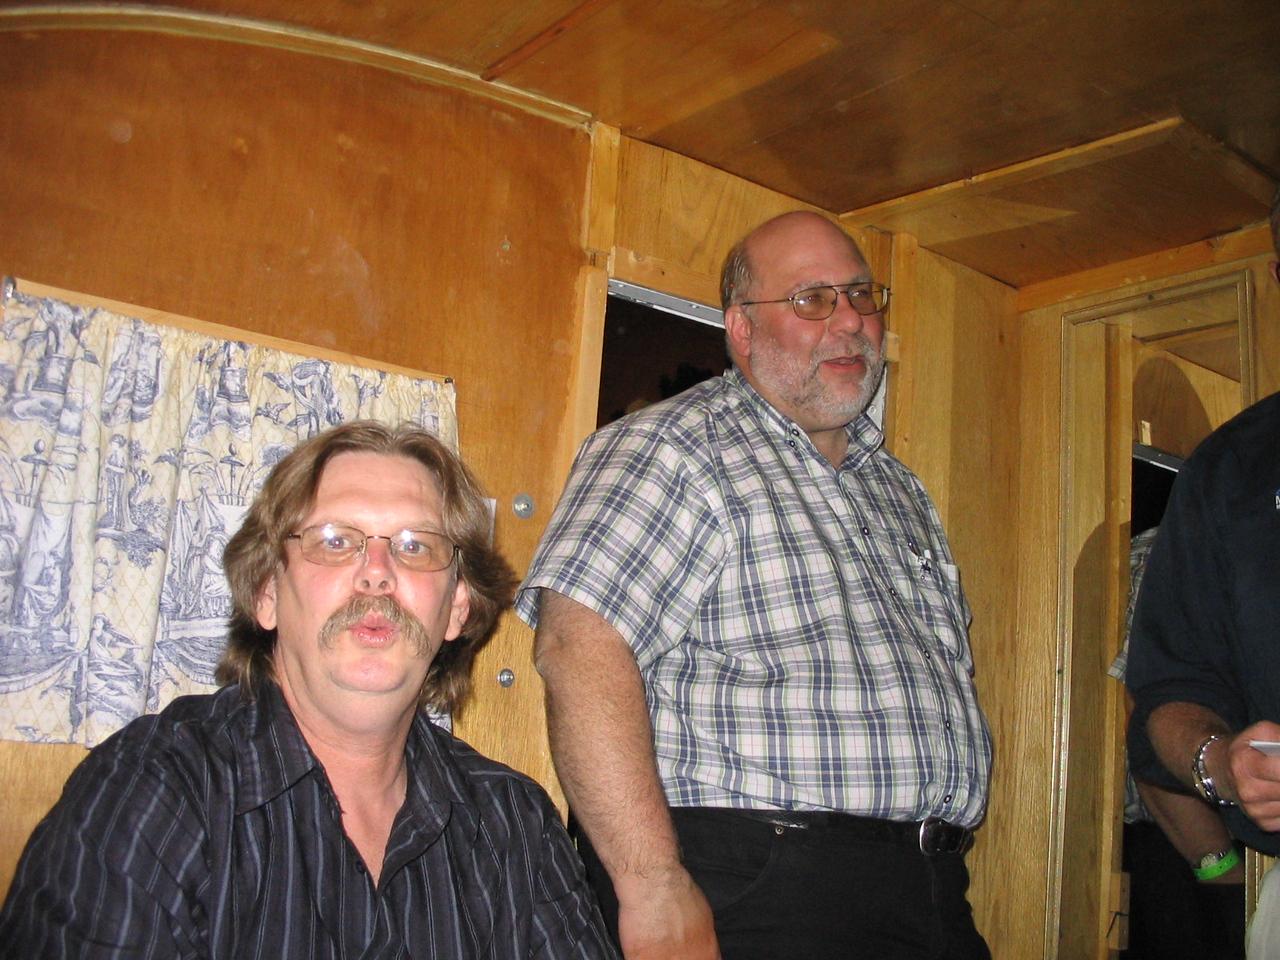 Joe Denton, the web master, with Mike Kneebone looking on.